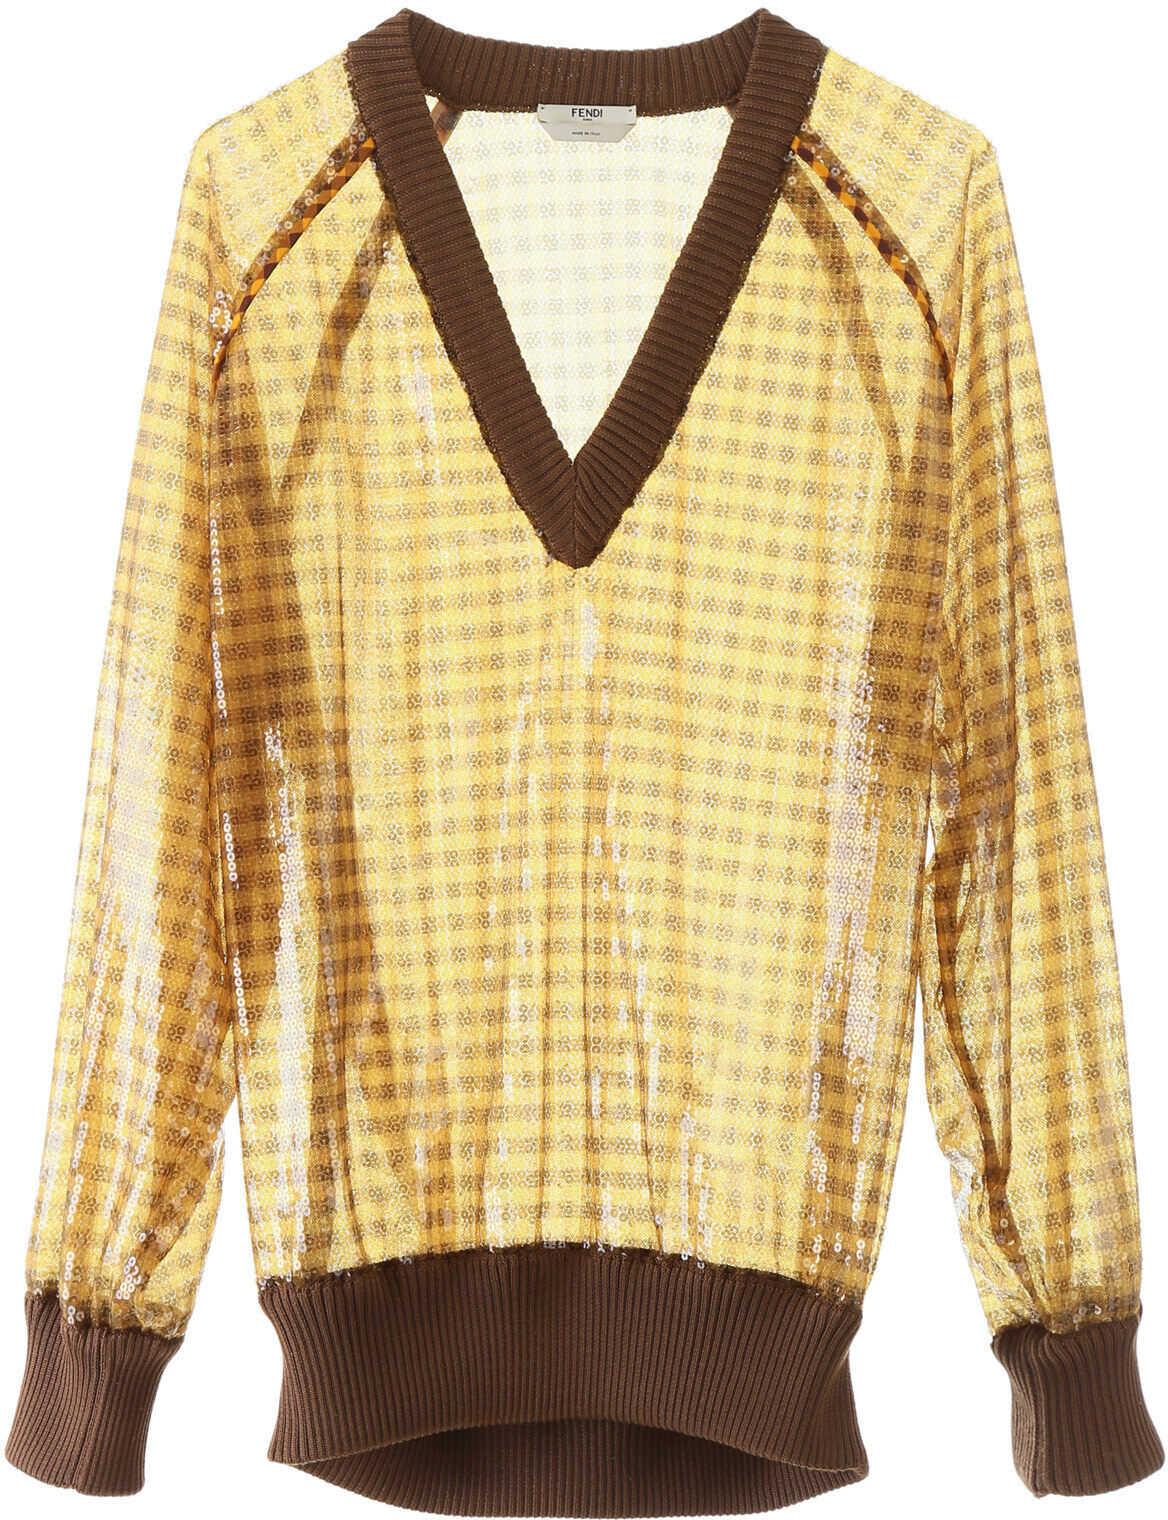 Fendi Sequined Vichy Sweater MEDLAR